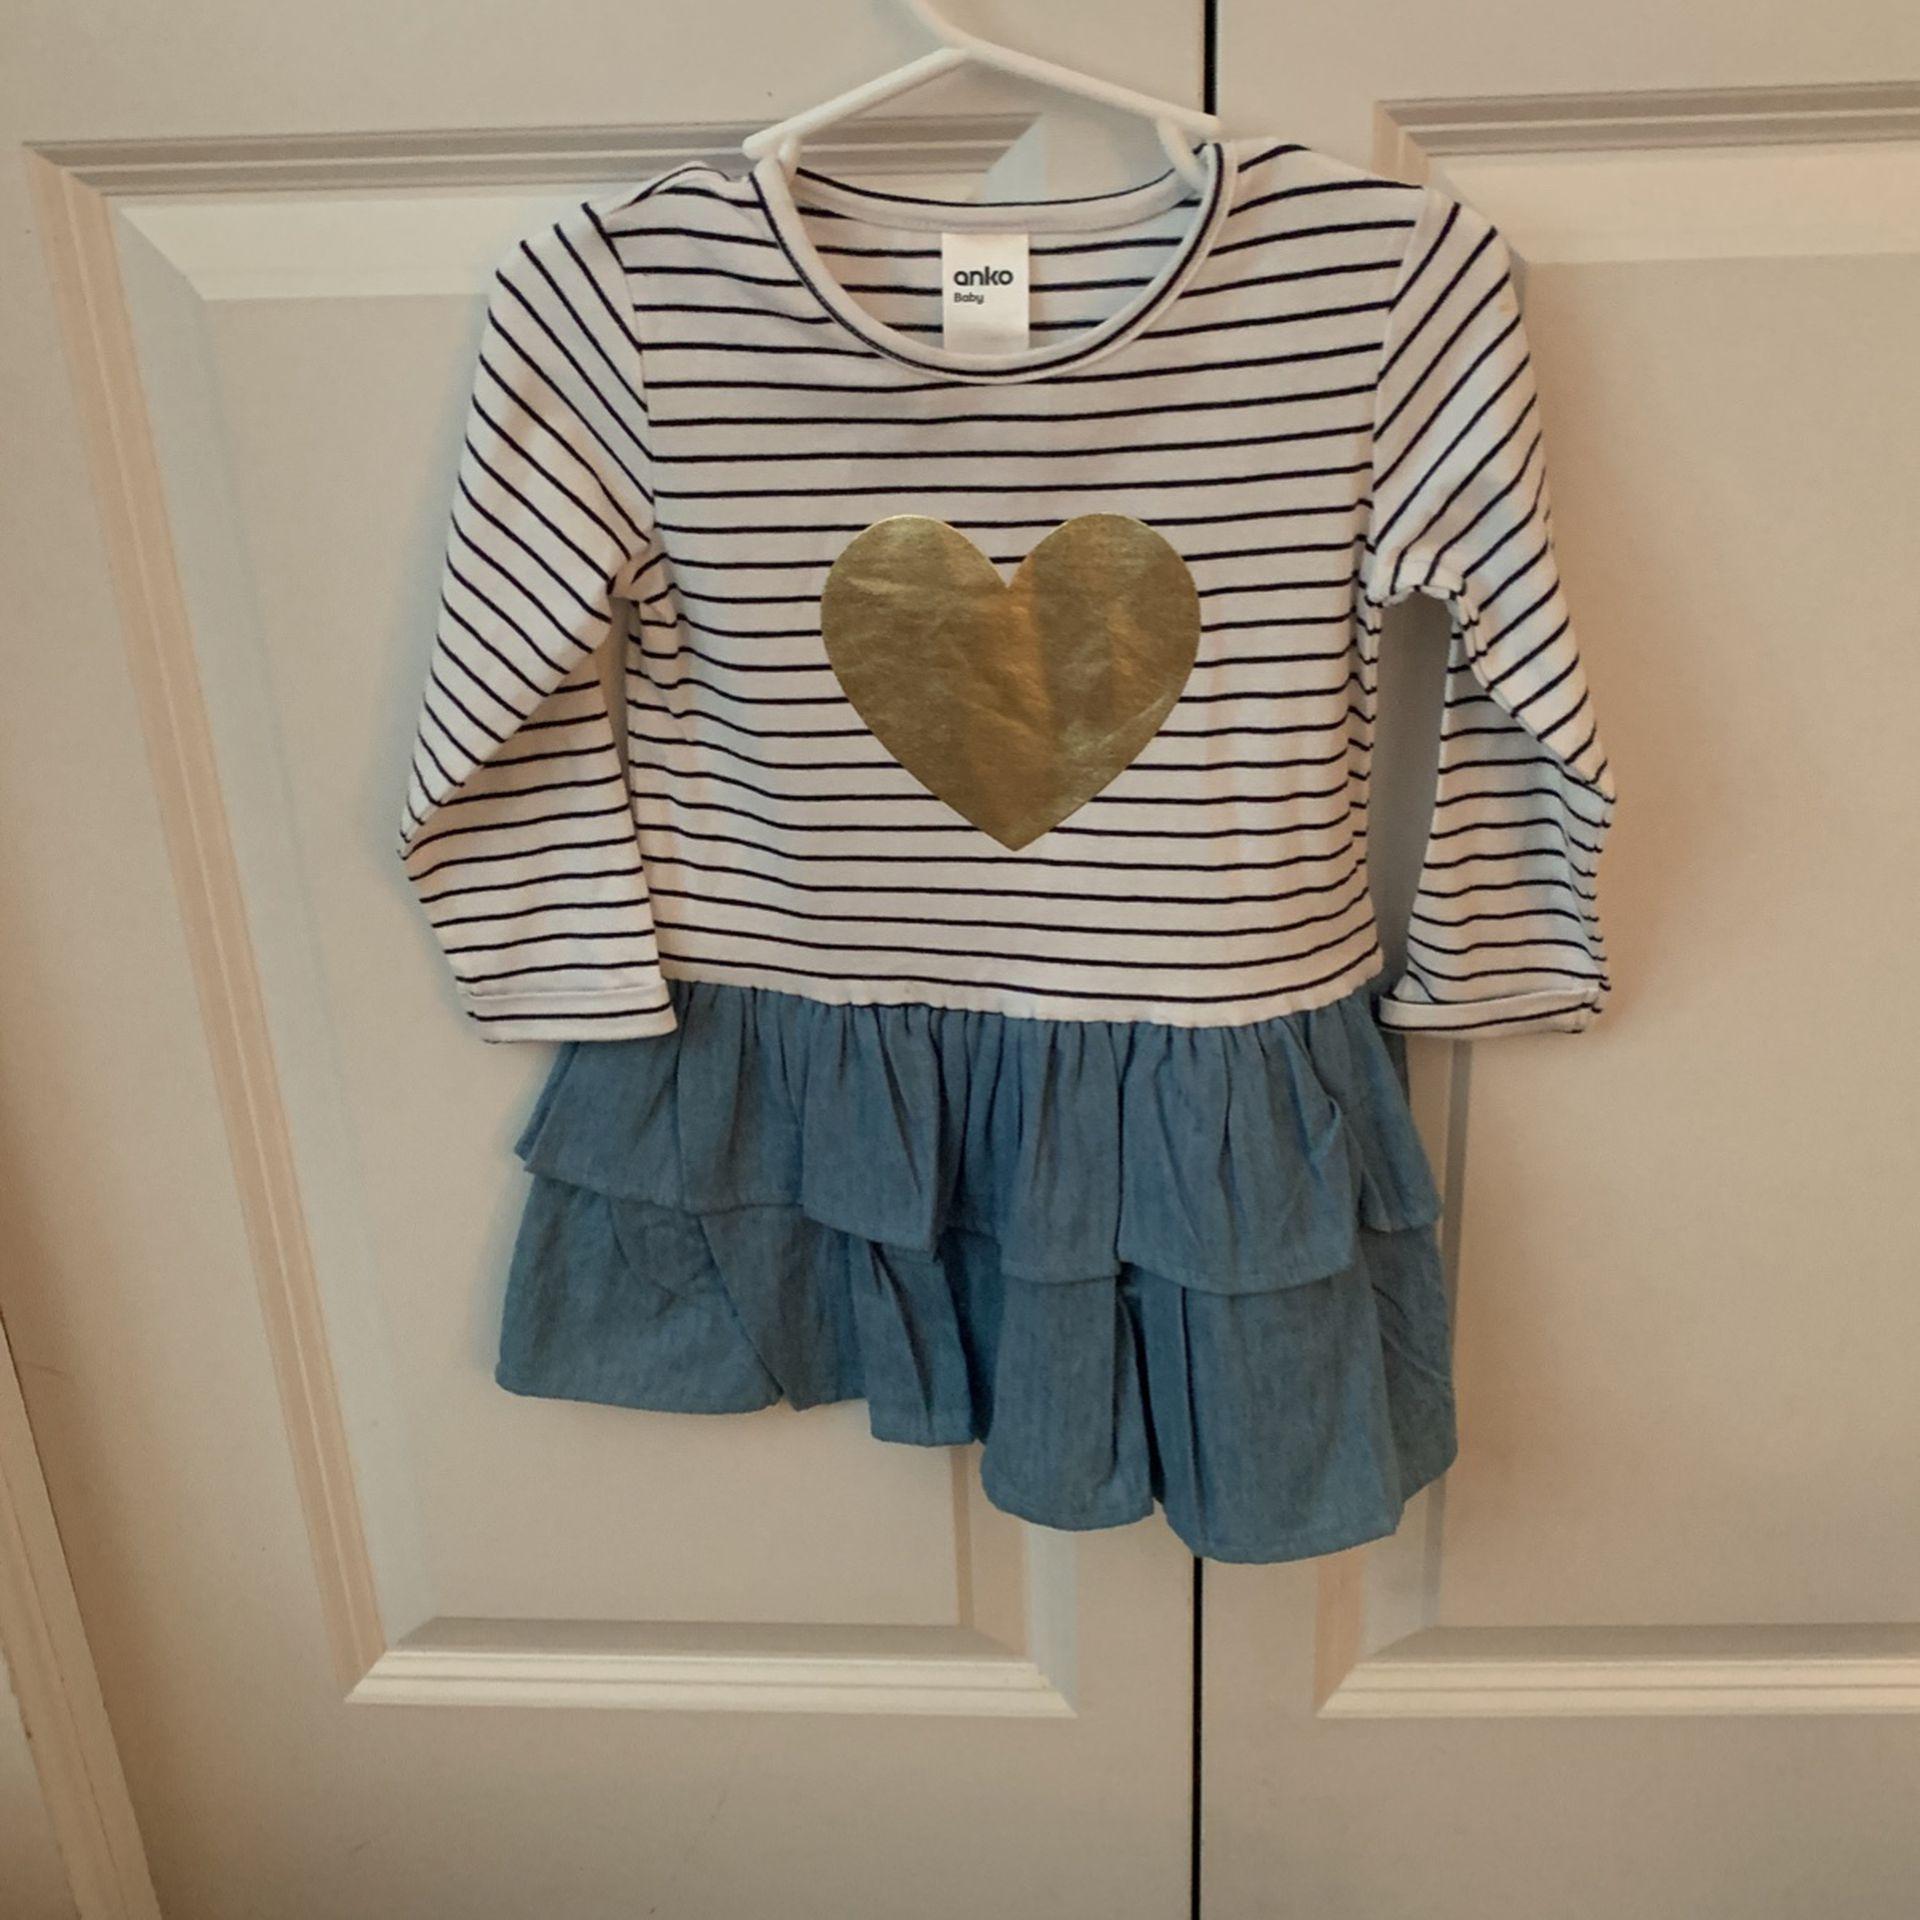 Anko Baby Dress 12-18 Months